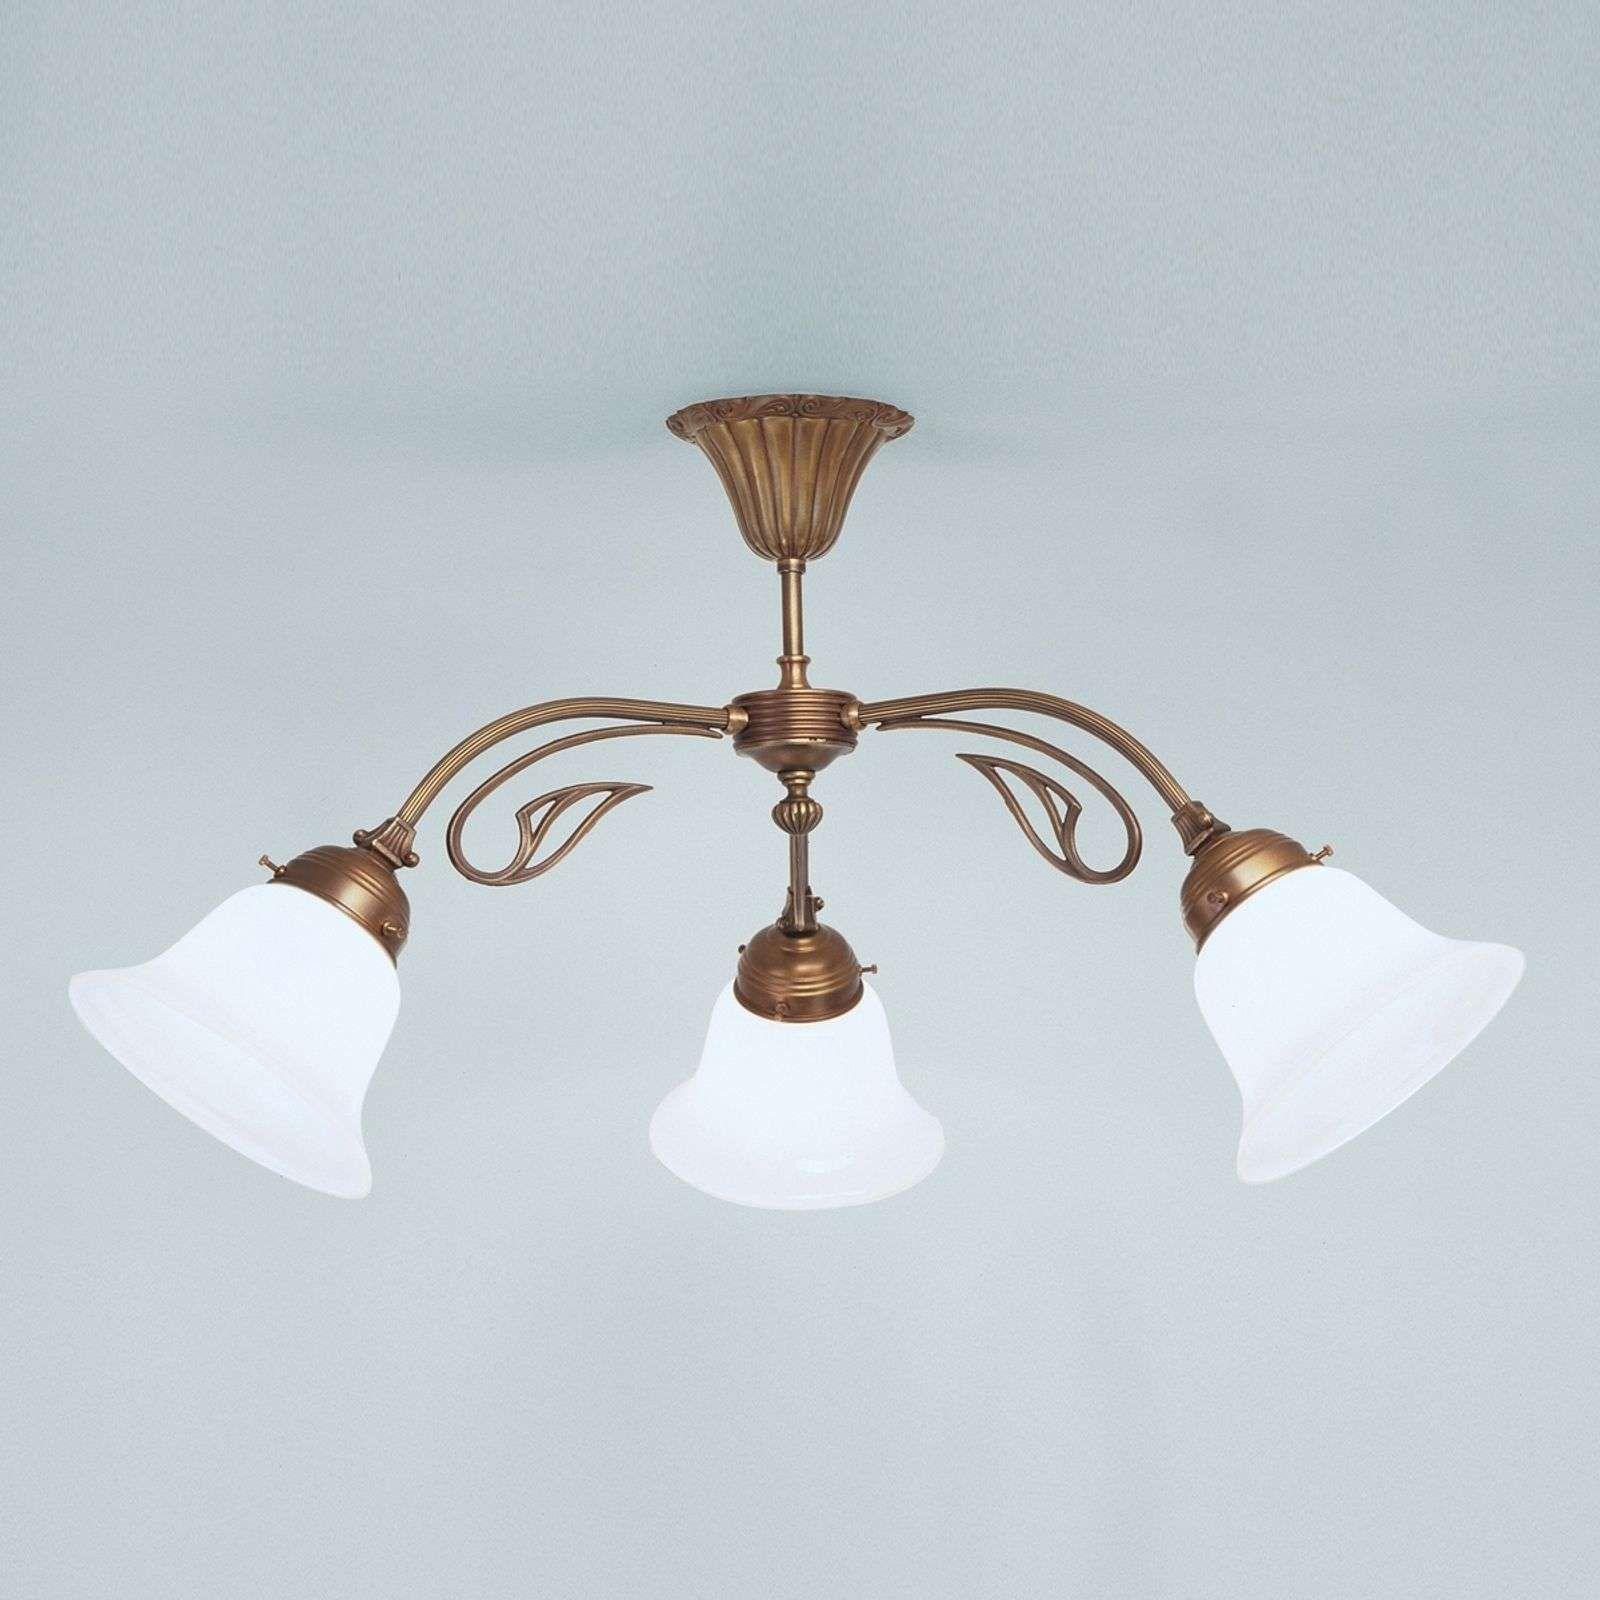 Spezielle Lampe F Badezimmer